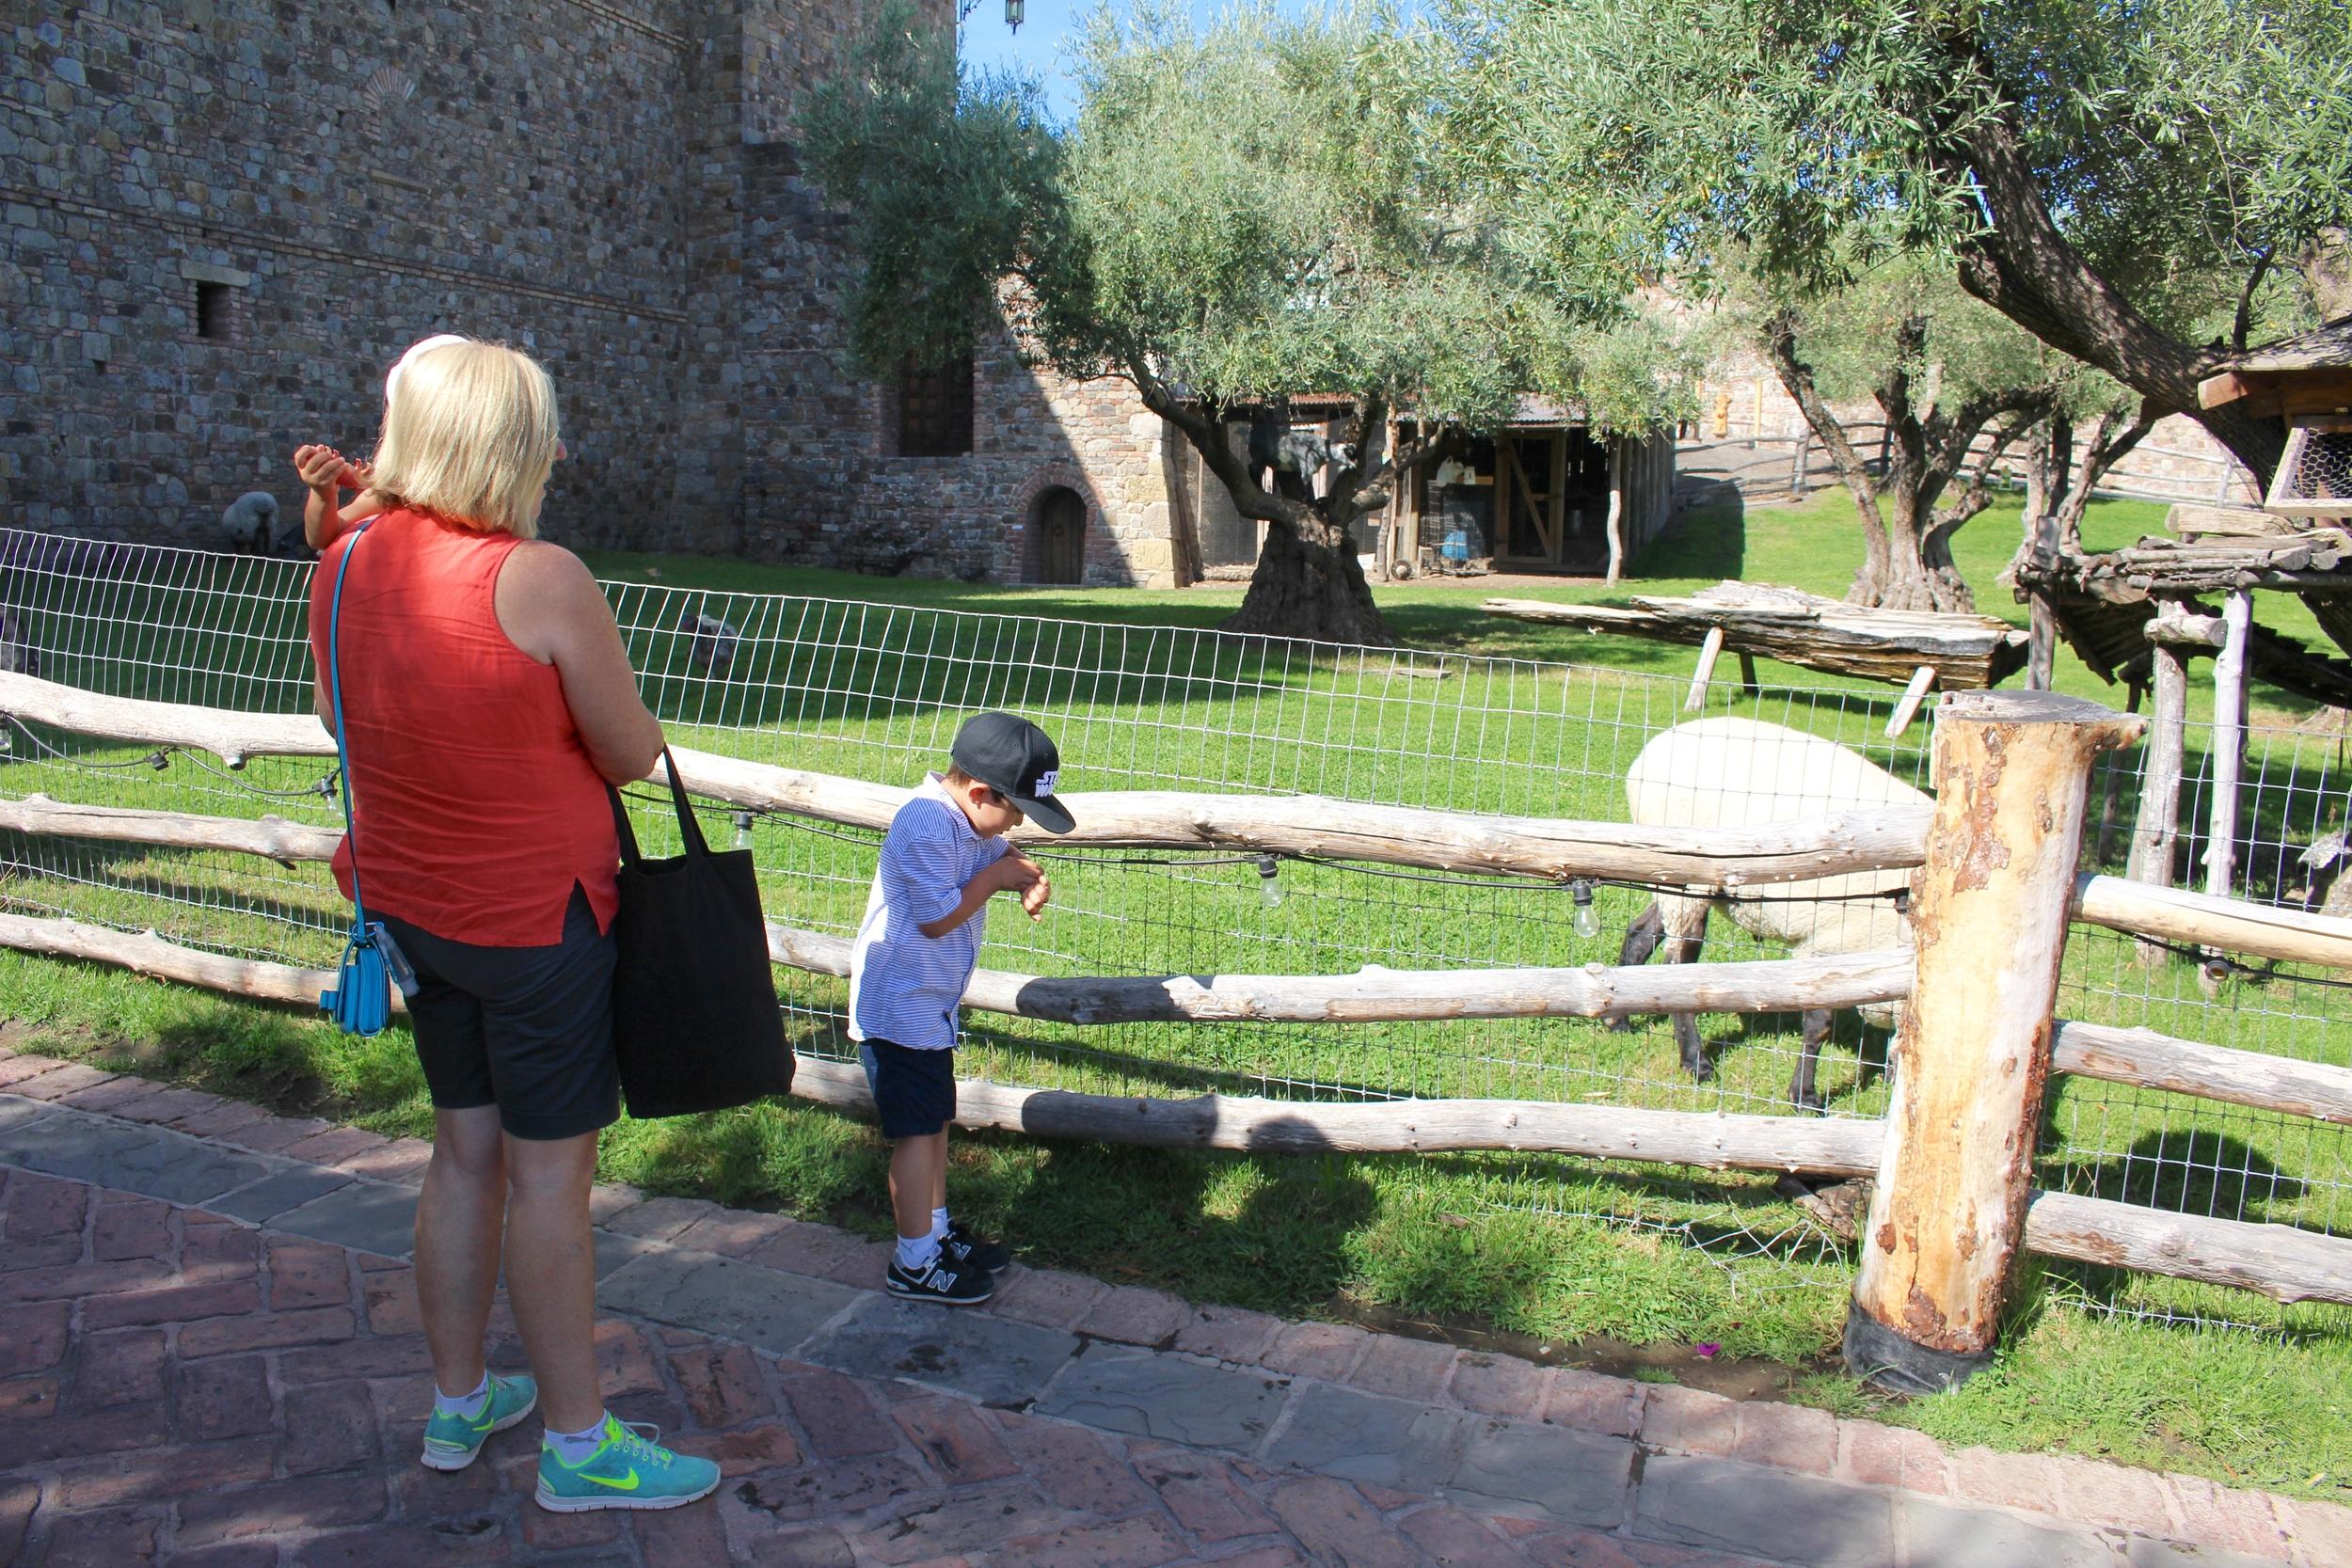 snapping photos of sheep ^.^